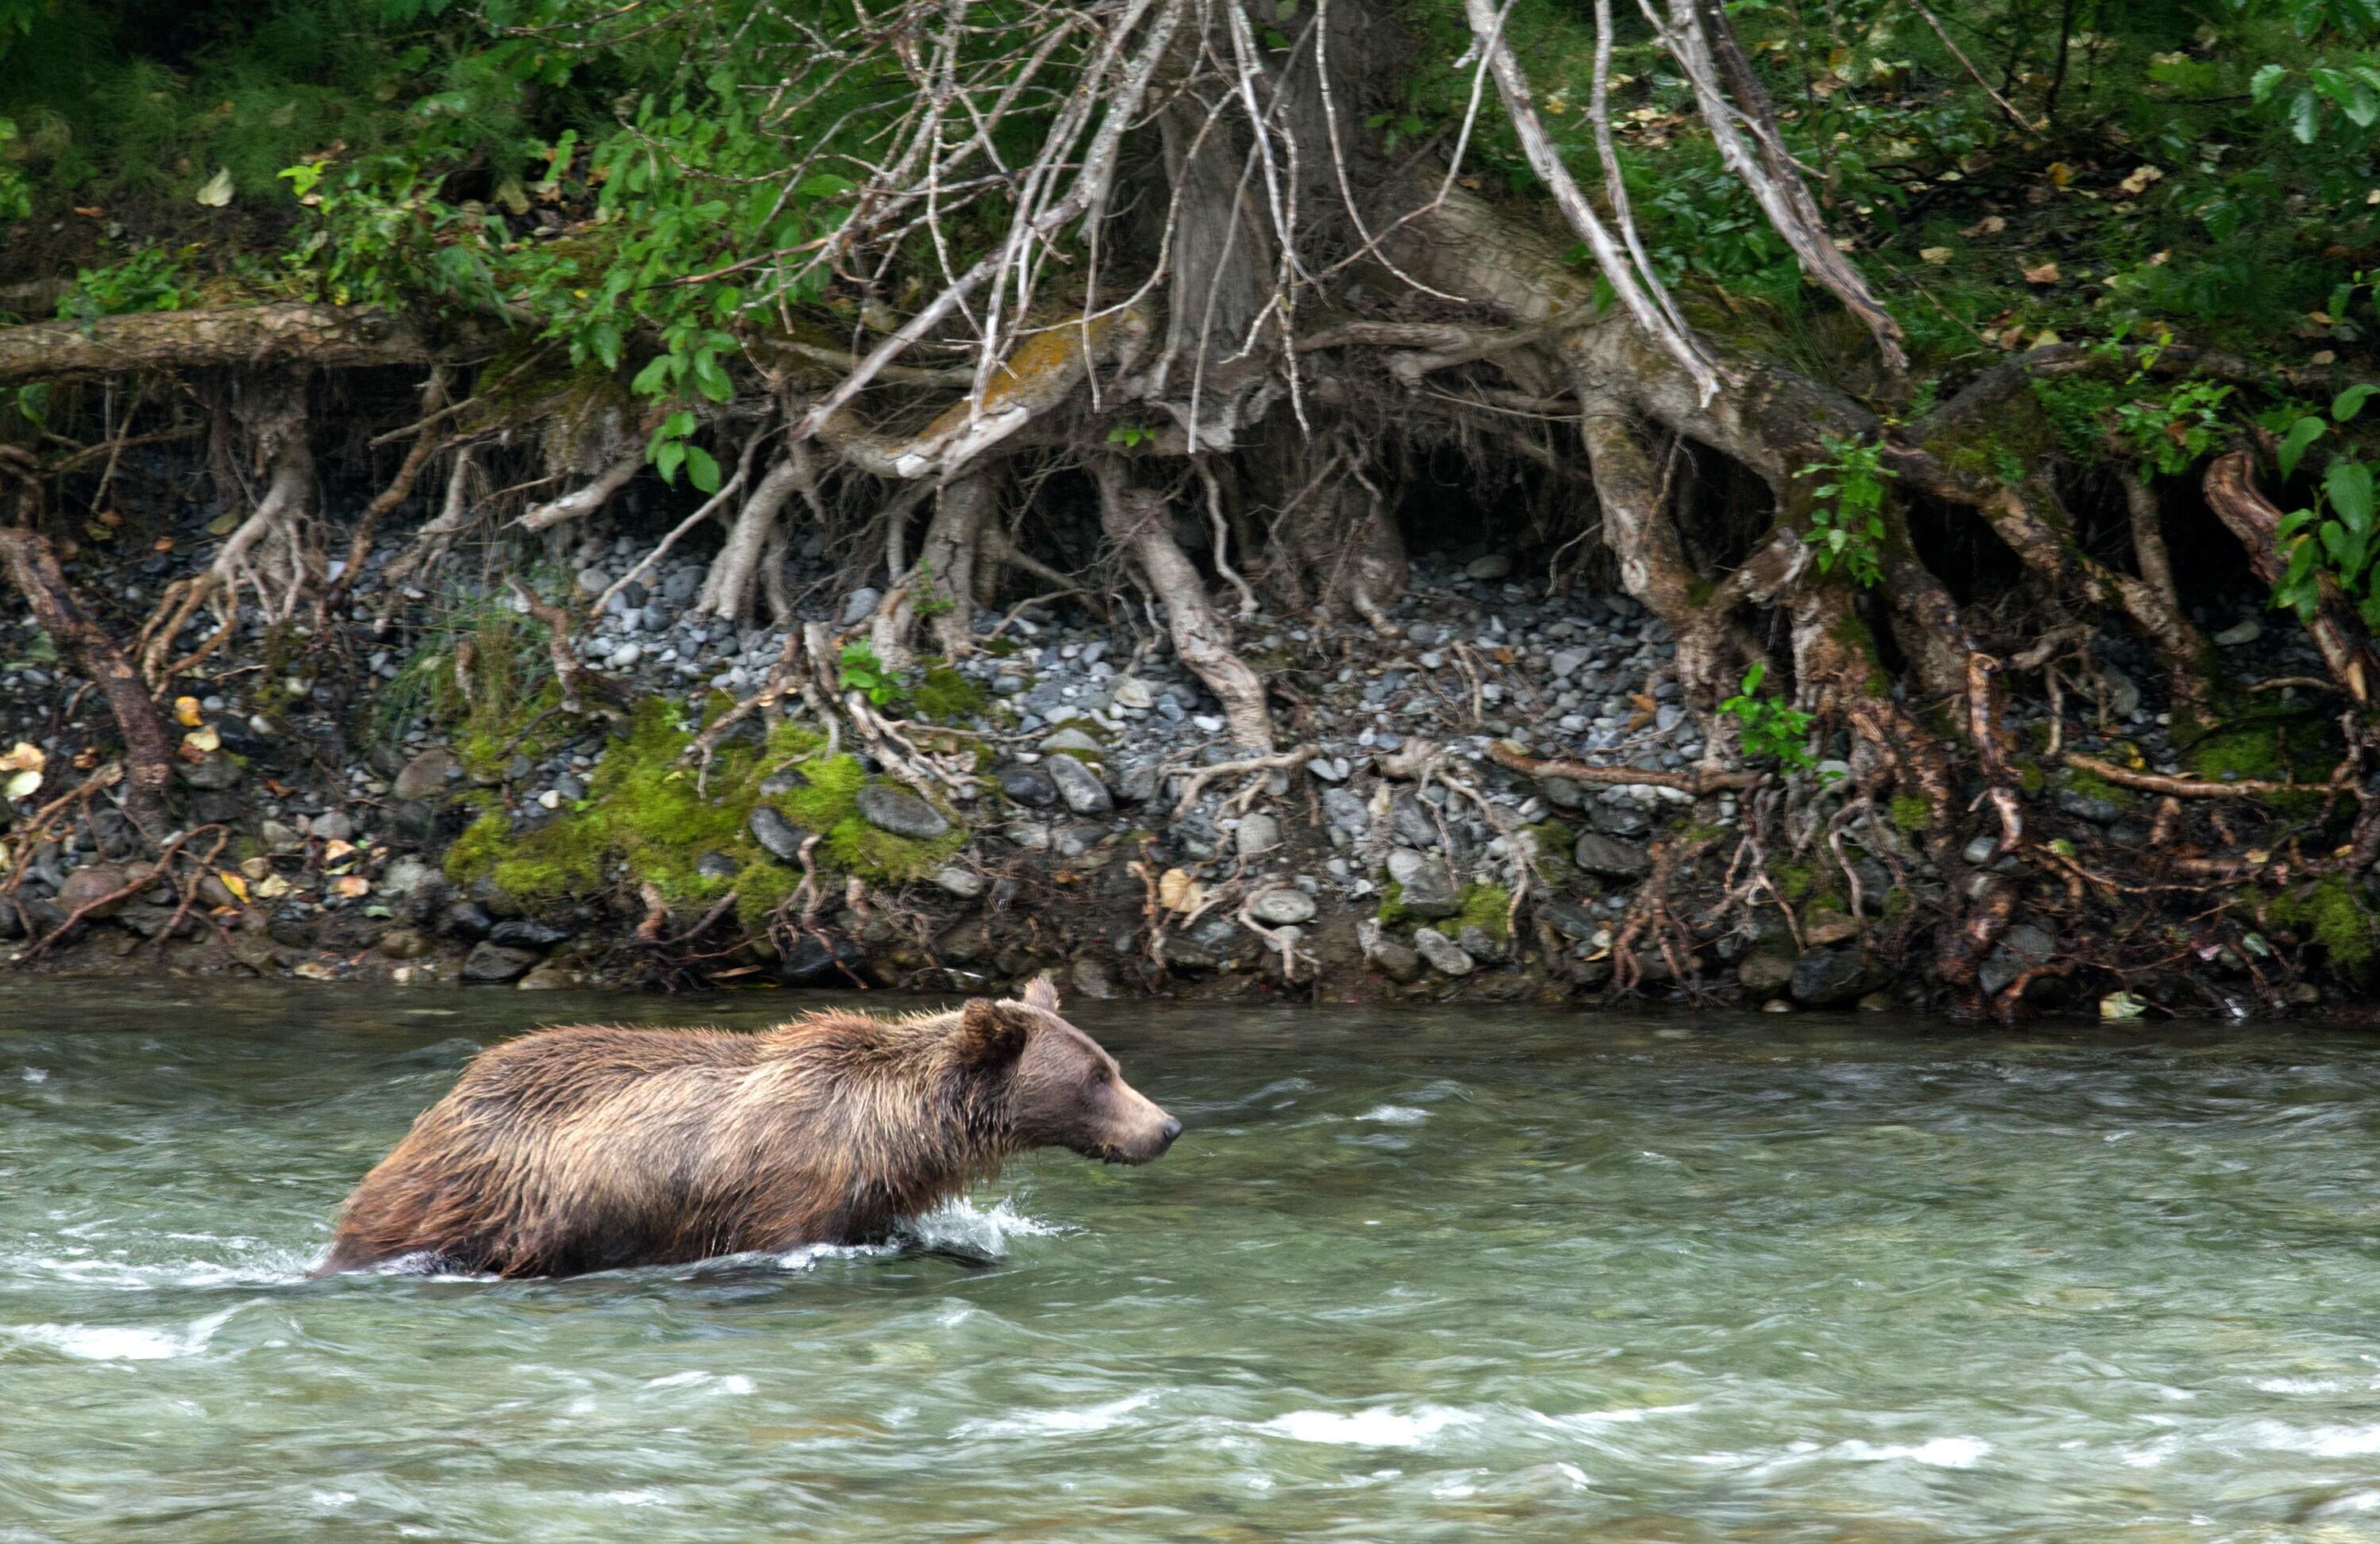 Fern hunts for salmon in the river. (National Geographic for Disney+/Samuel Ellis)